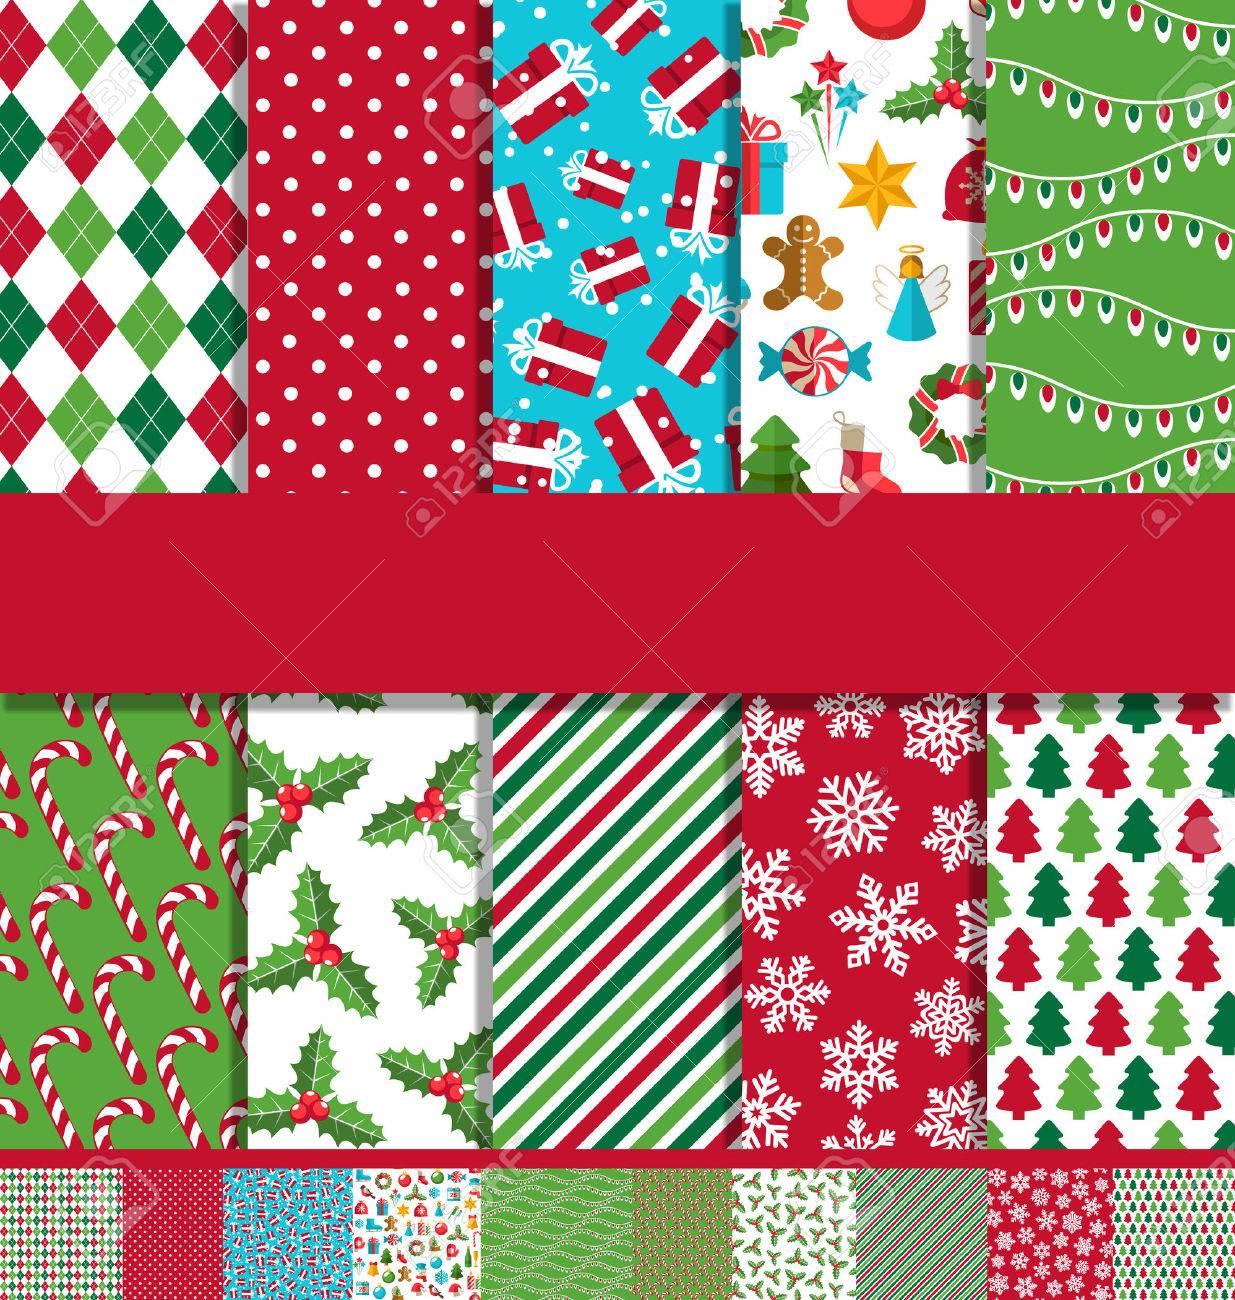 Set of 10 Seamless Bright Fun Christmas Patterns - 48734537